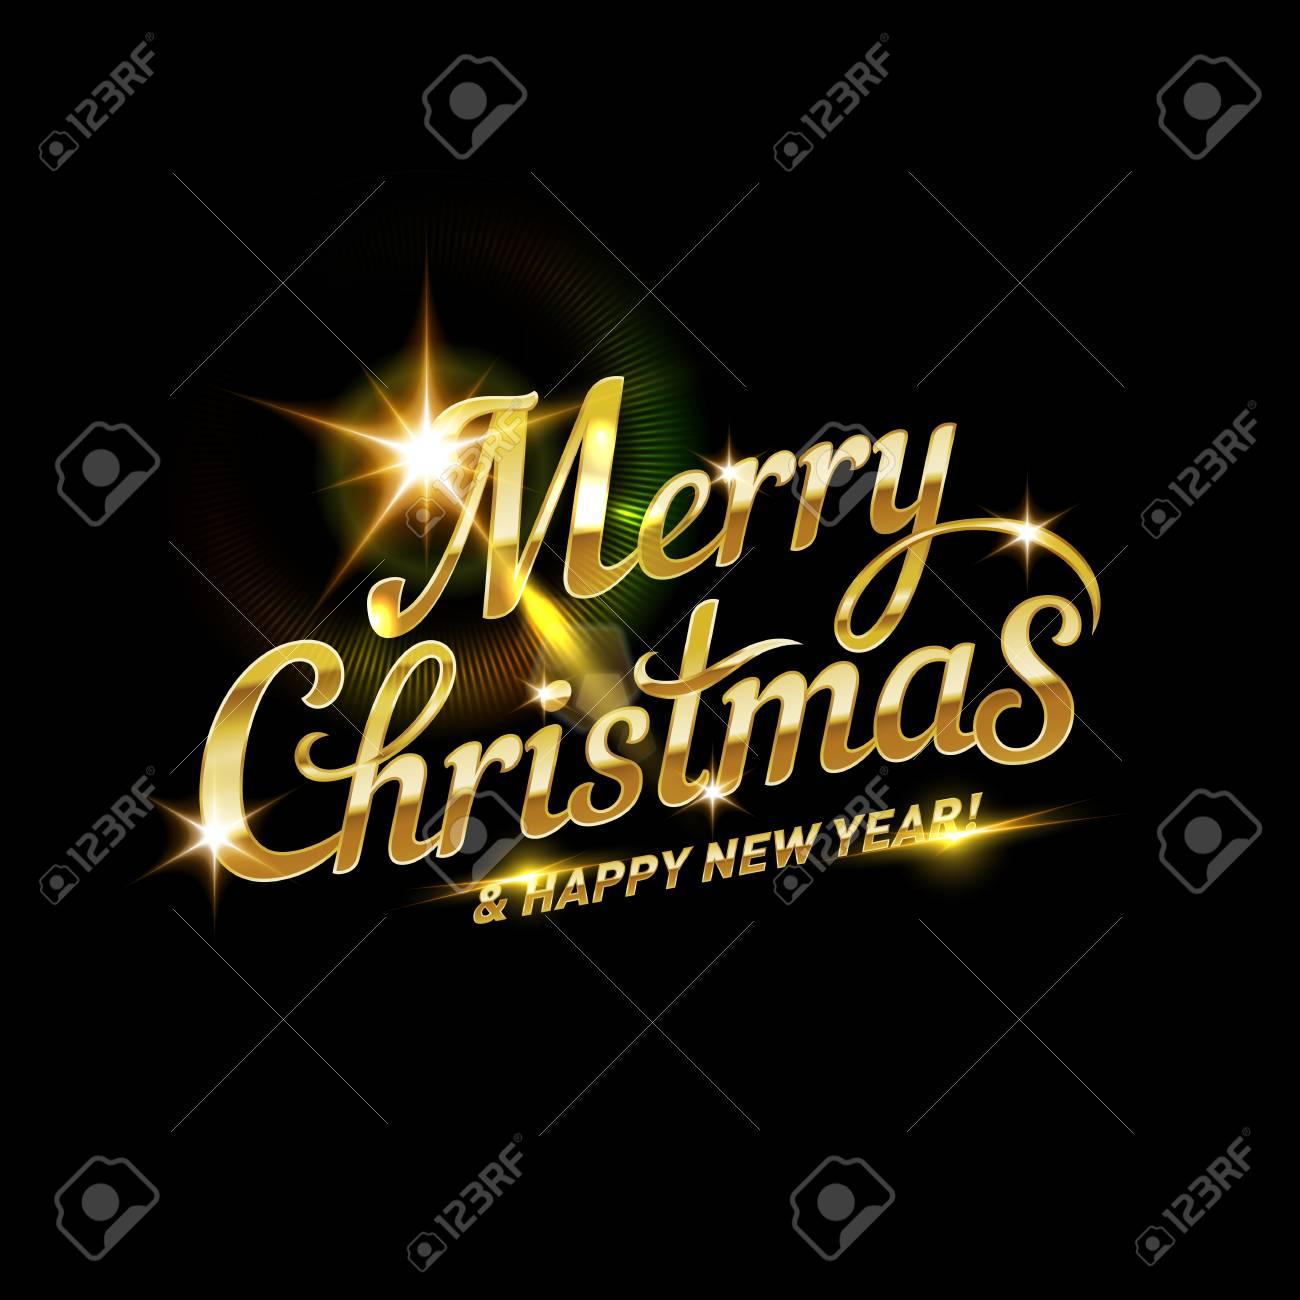 Schriftzug Frohe Weihnachten Beleuchtet.Stock Photo